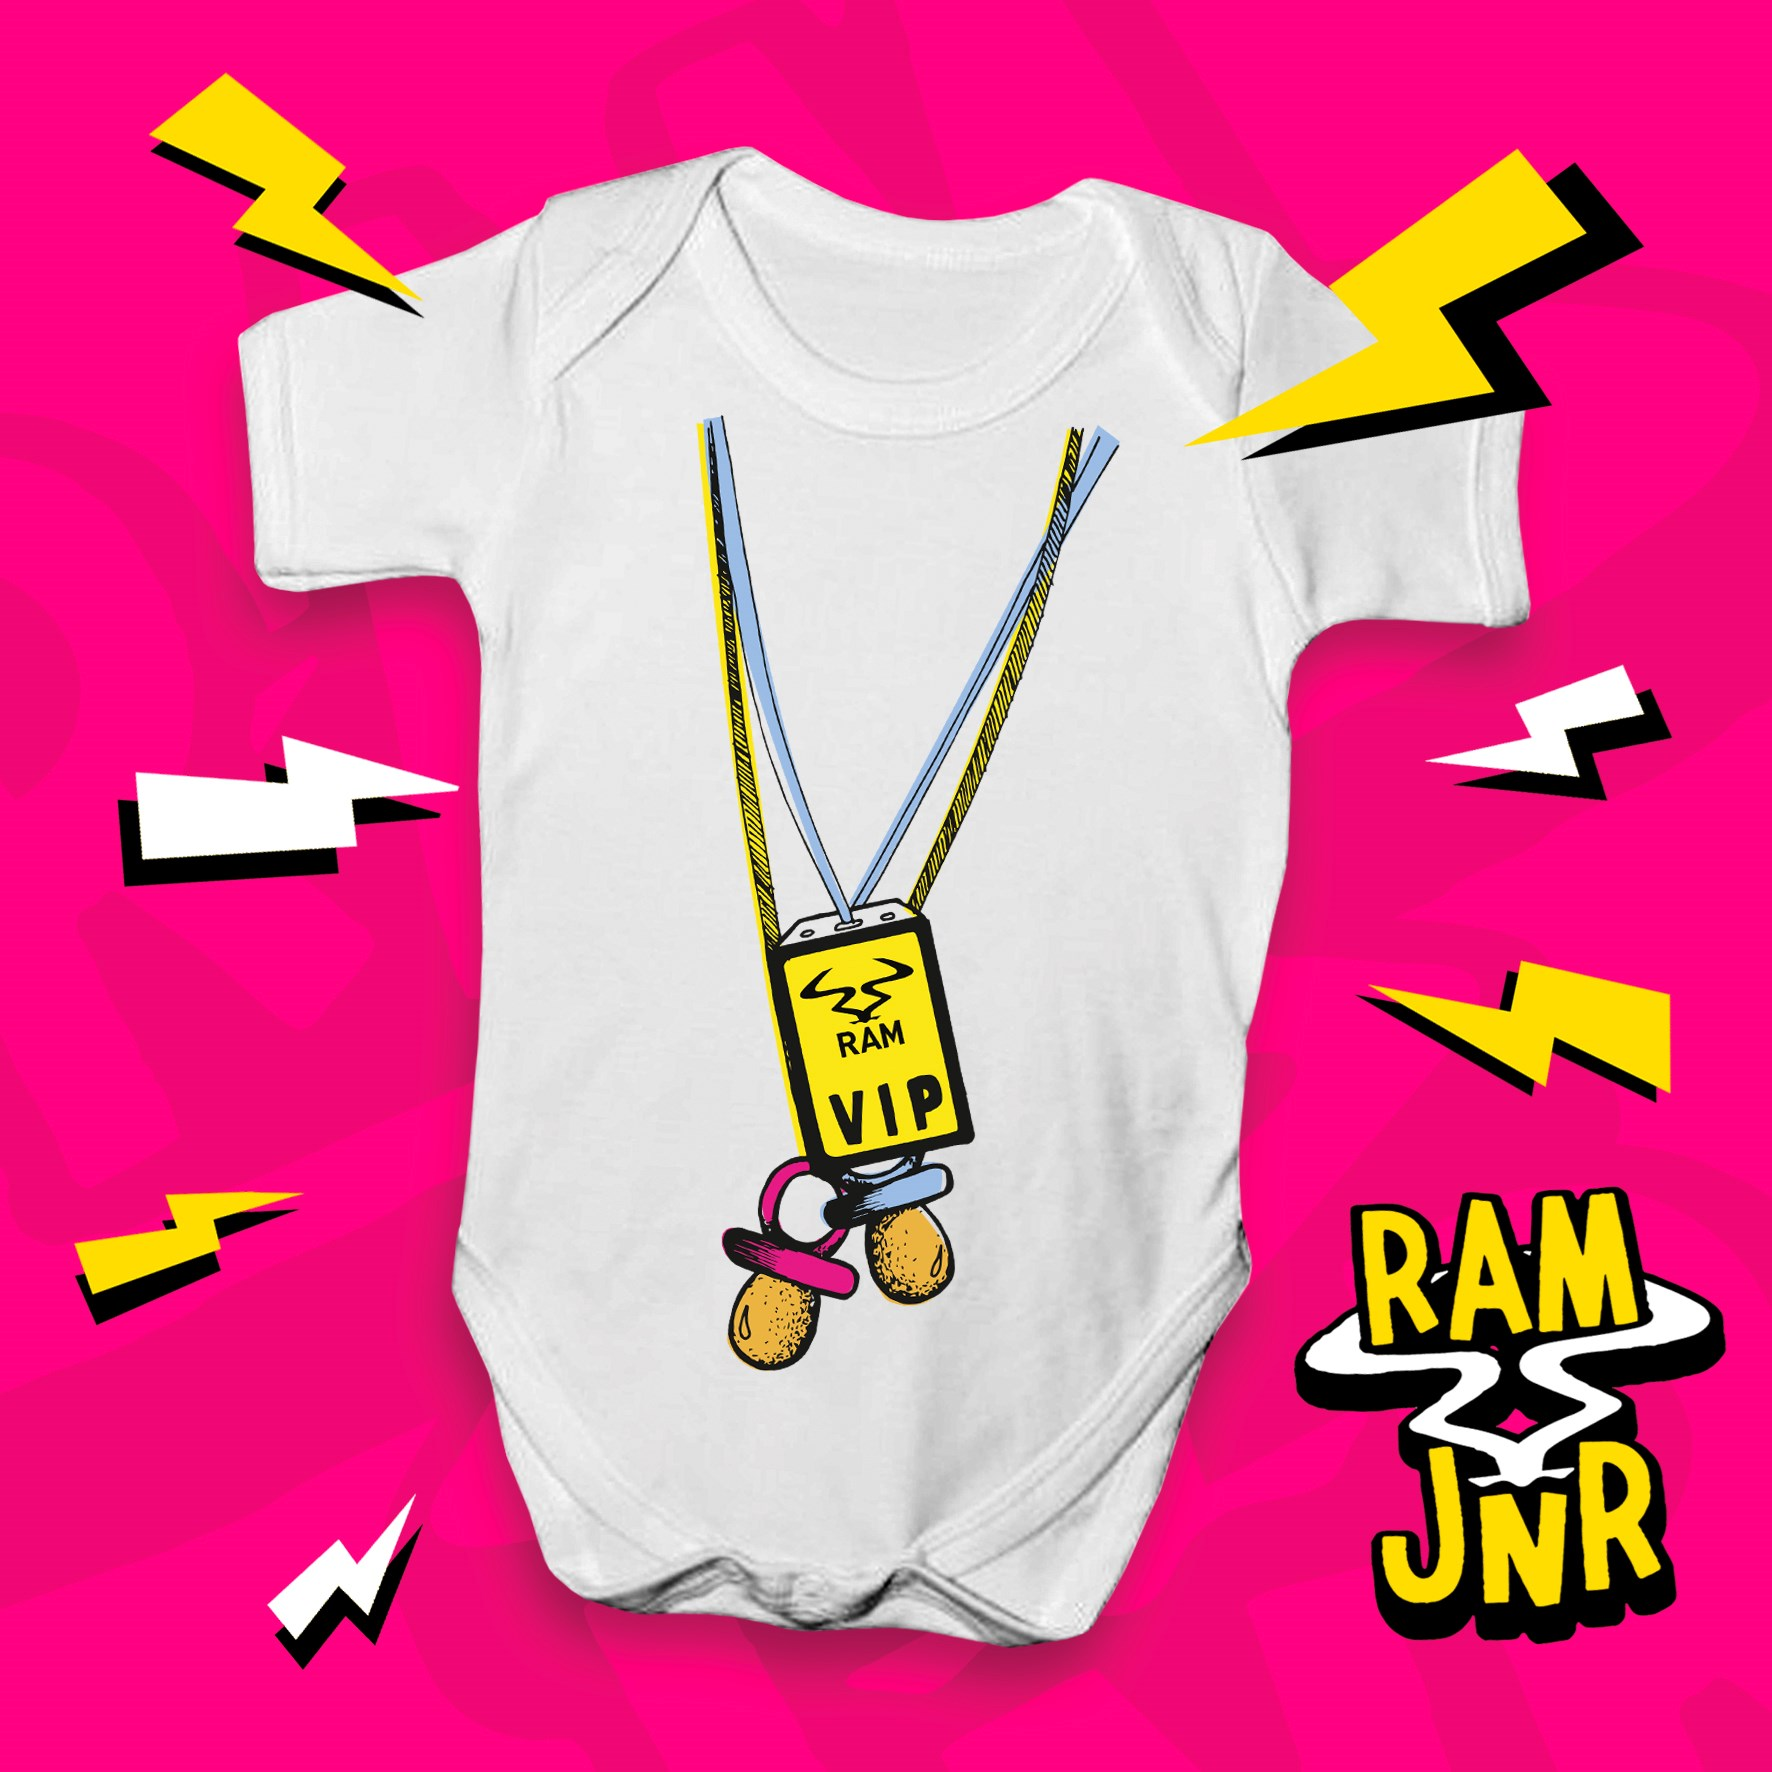 332ec8a7e5b RAM JNR VIP Babygrow